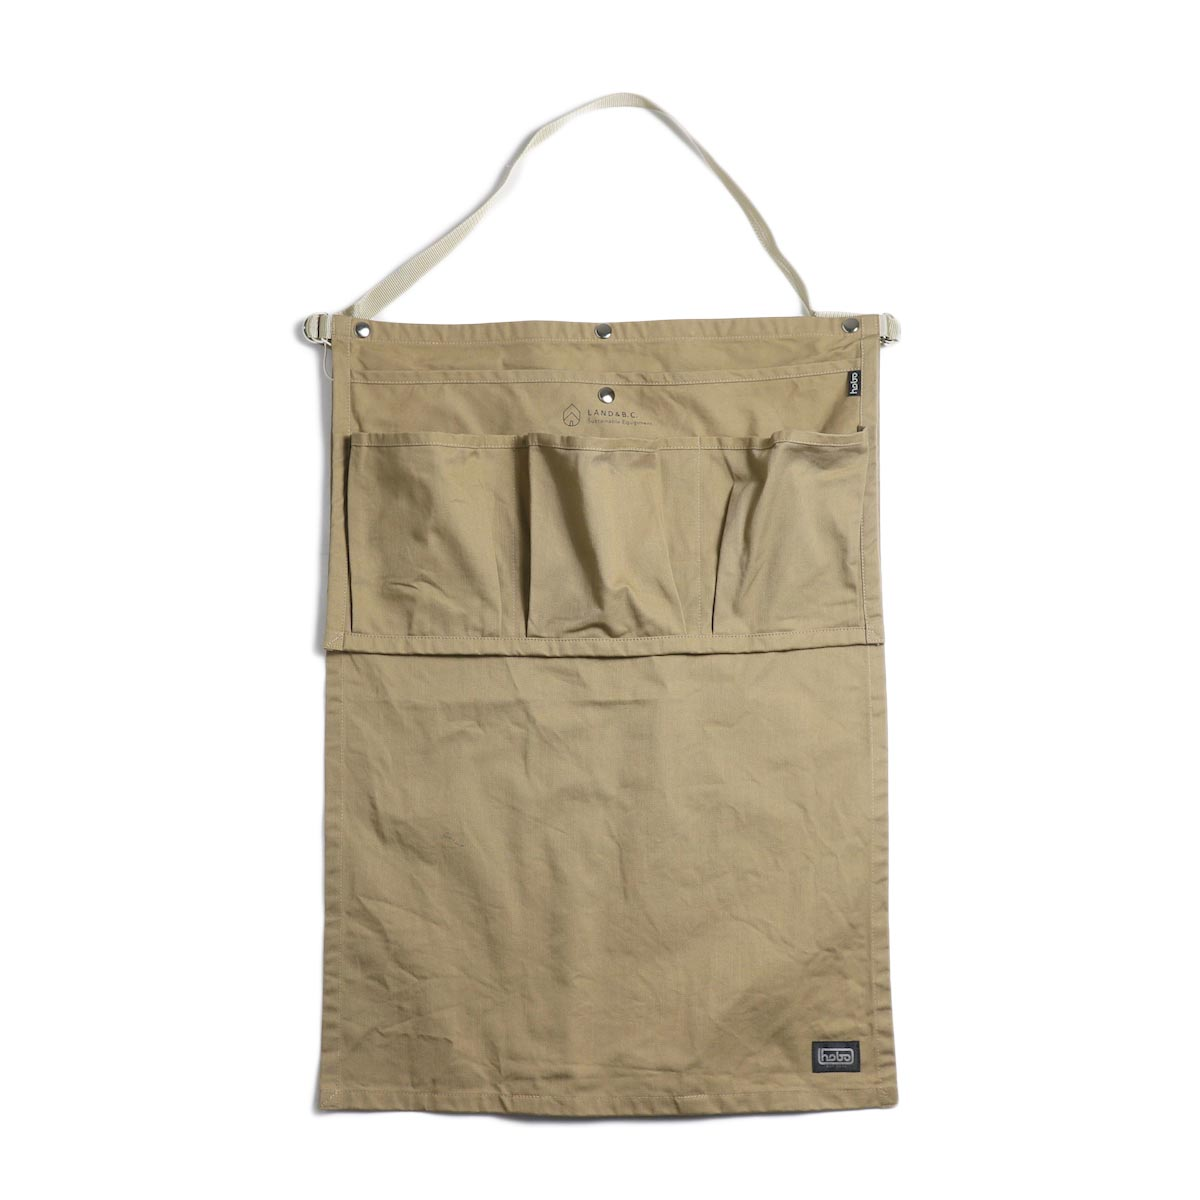 HOBO / Cotton Twill Gardener Apron by LAND & B.C. -beige